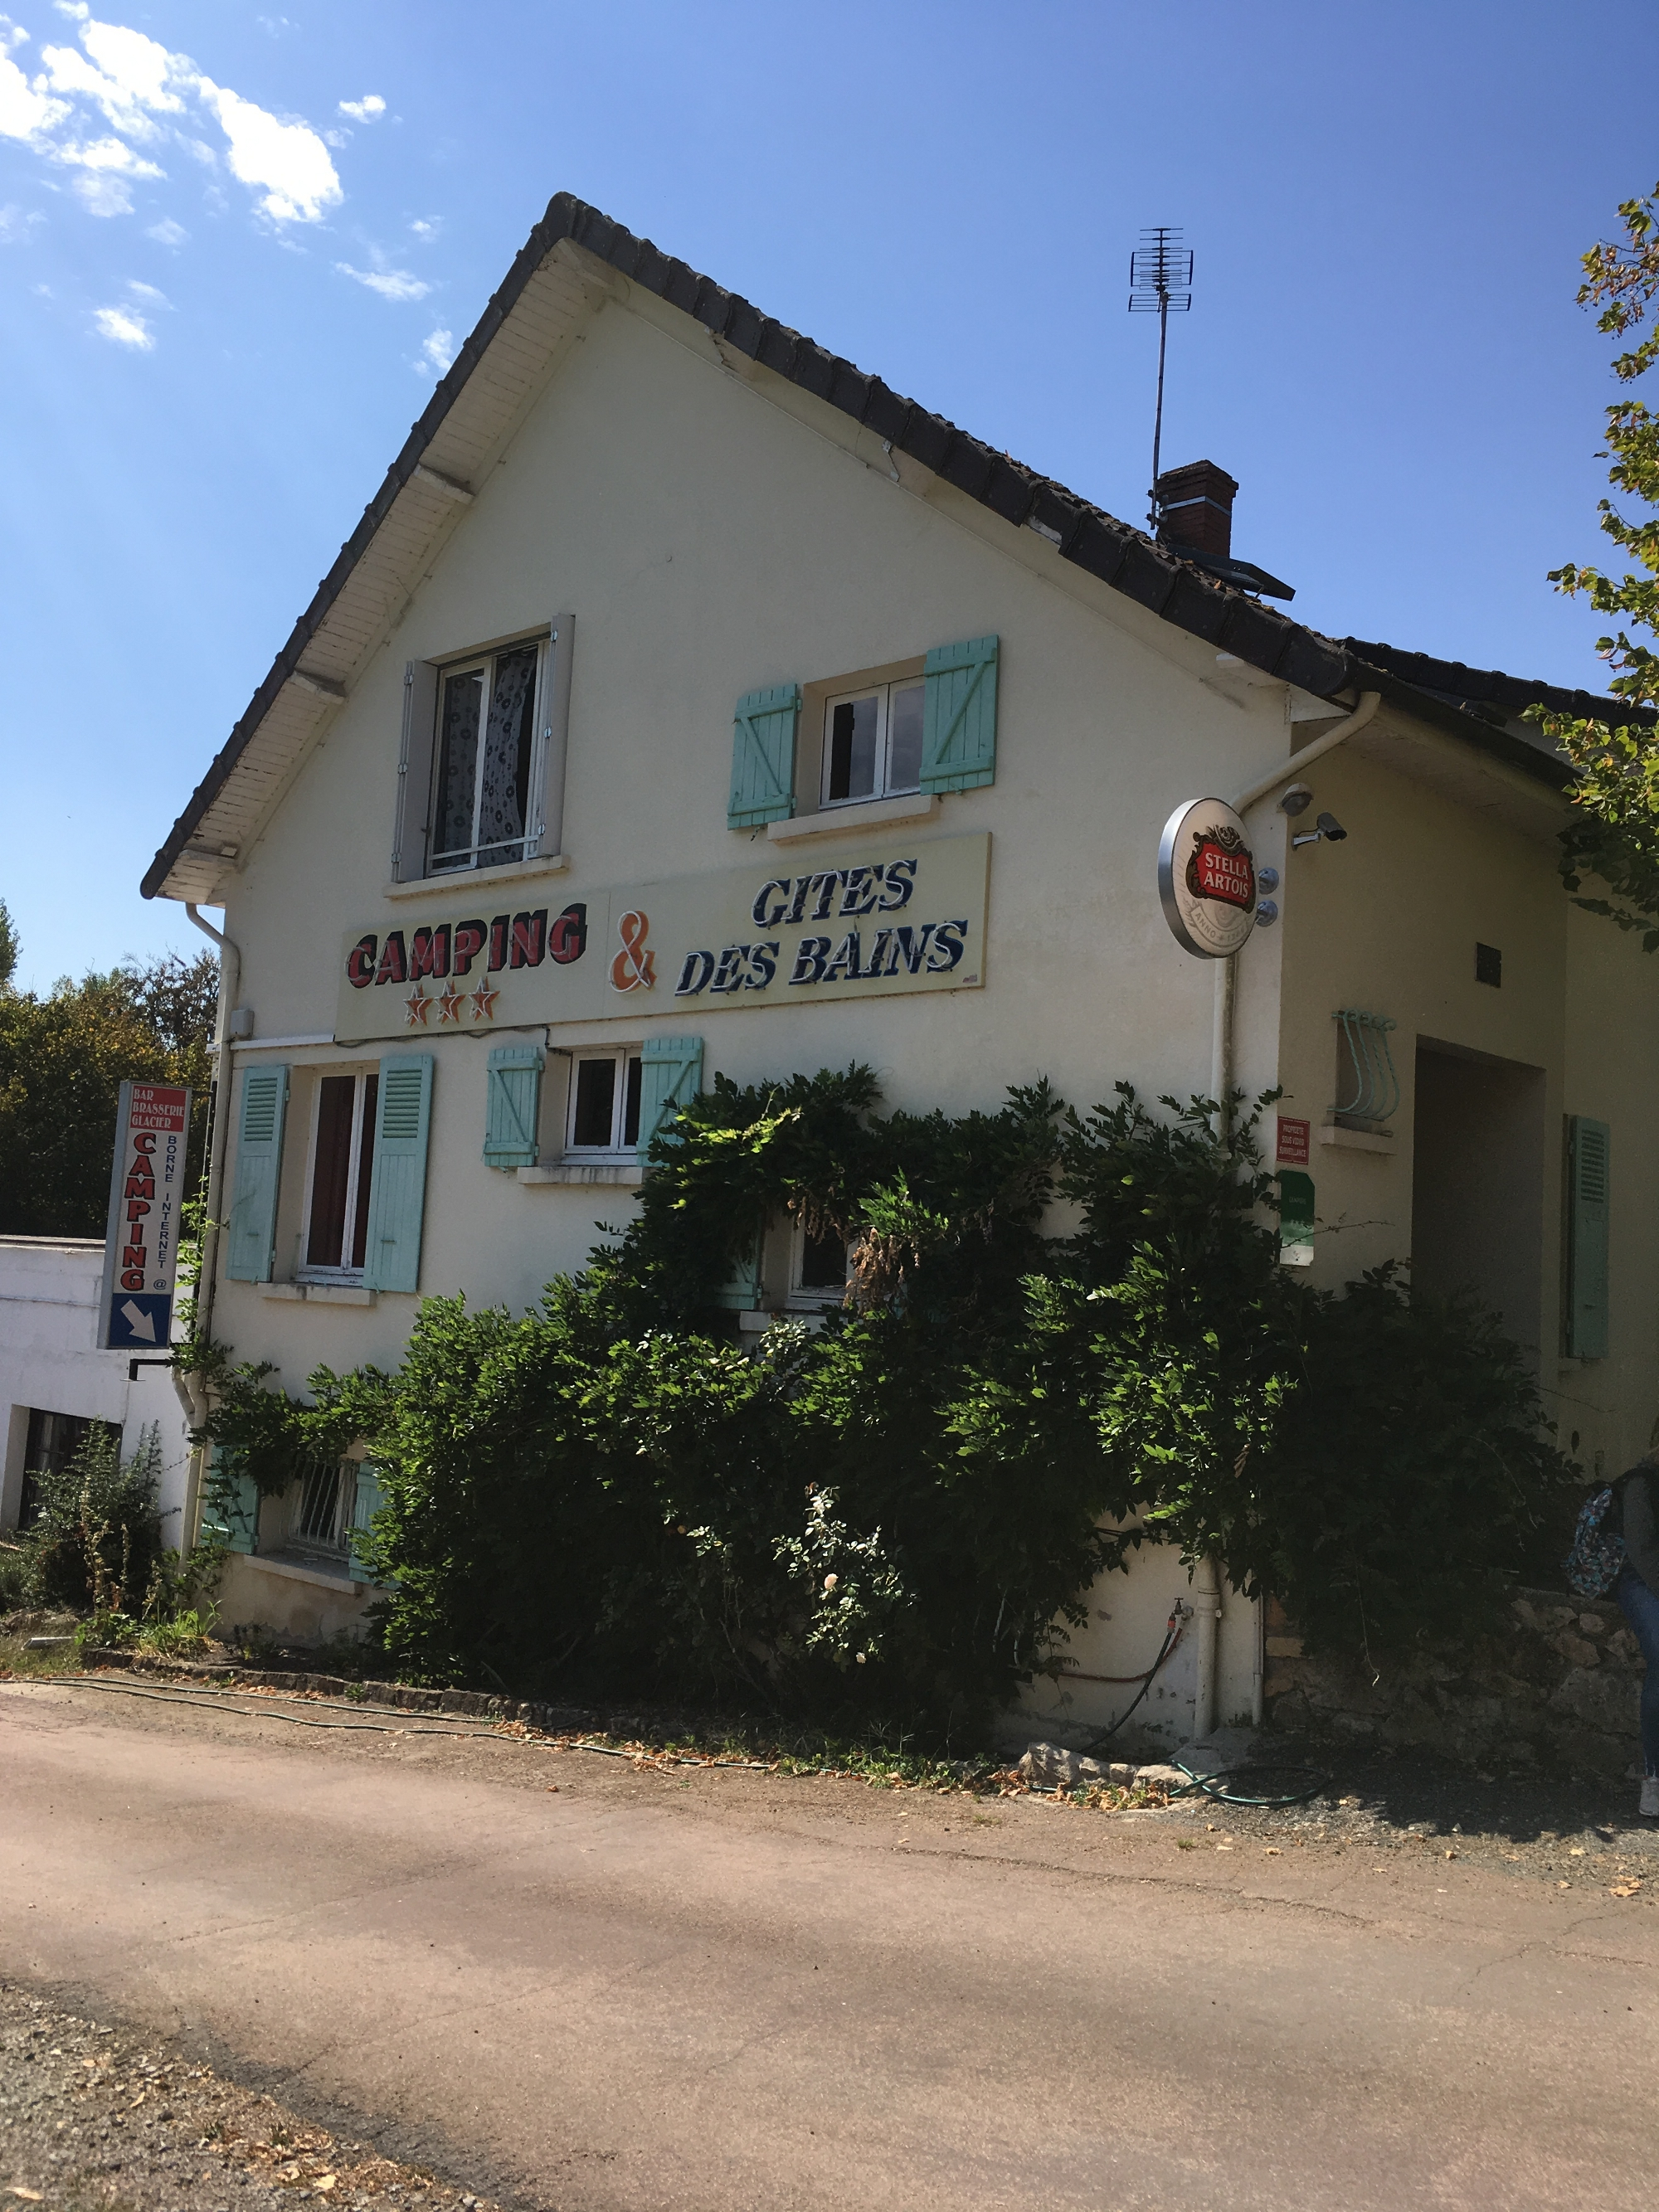 2018.09.12-filiere-SAPAT-Saint-Honore-les-Bains.16